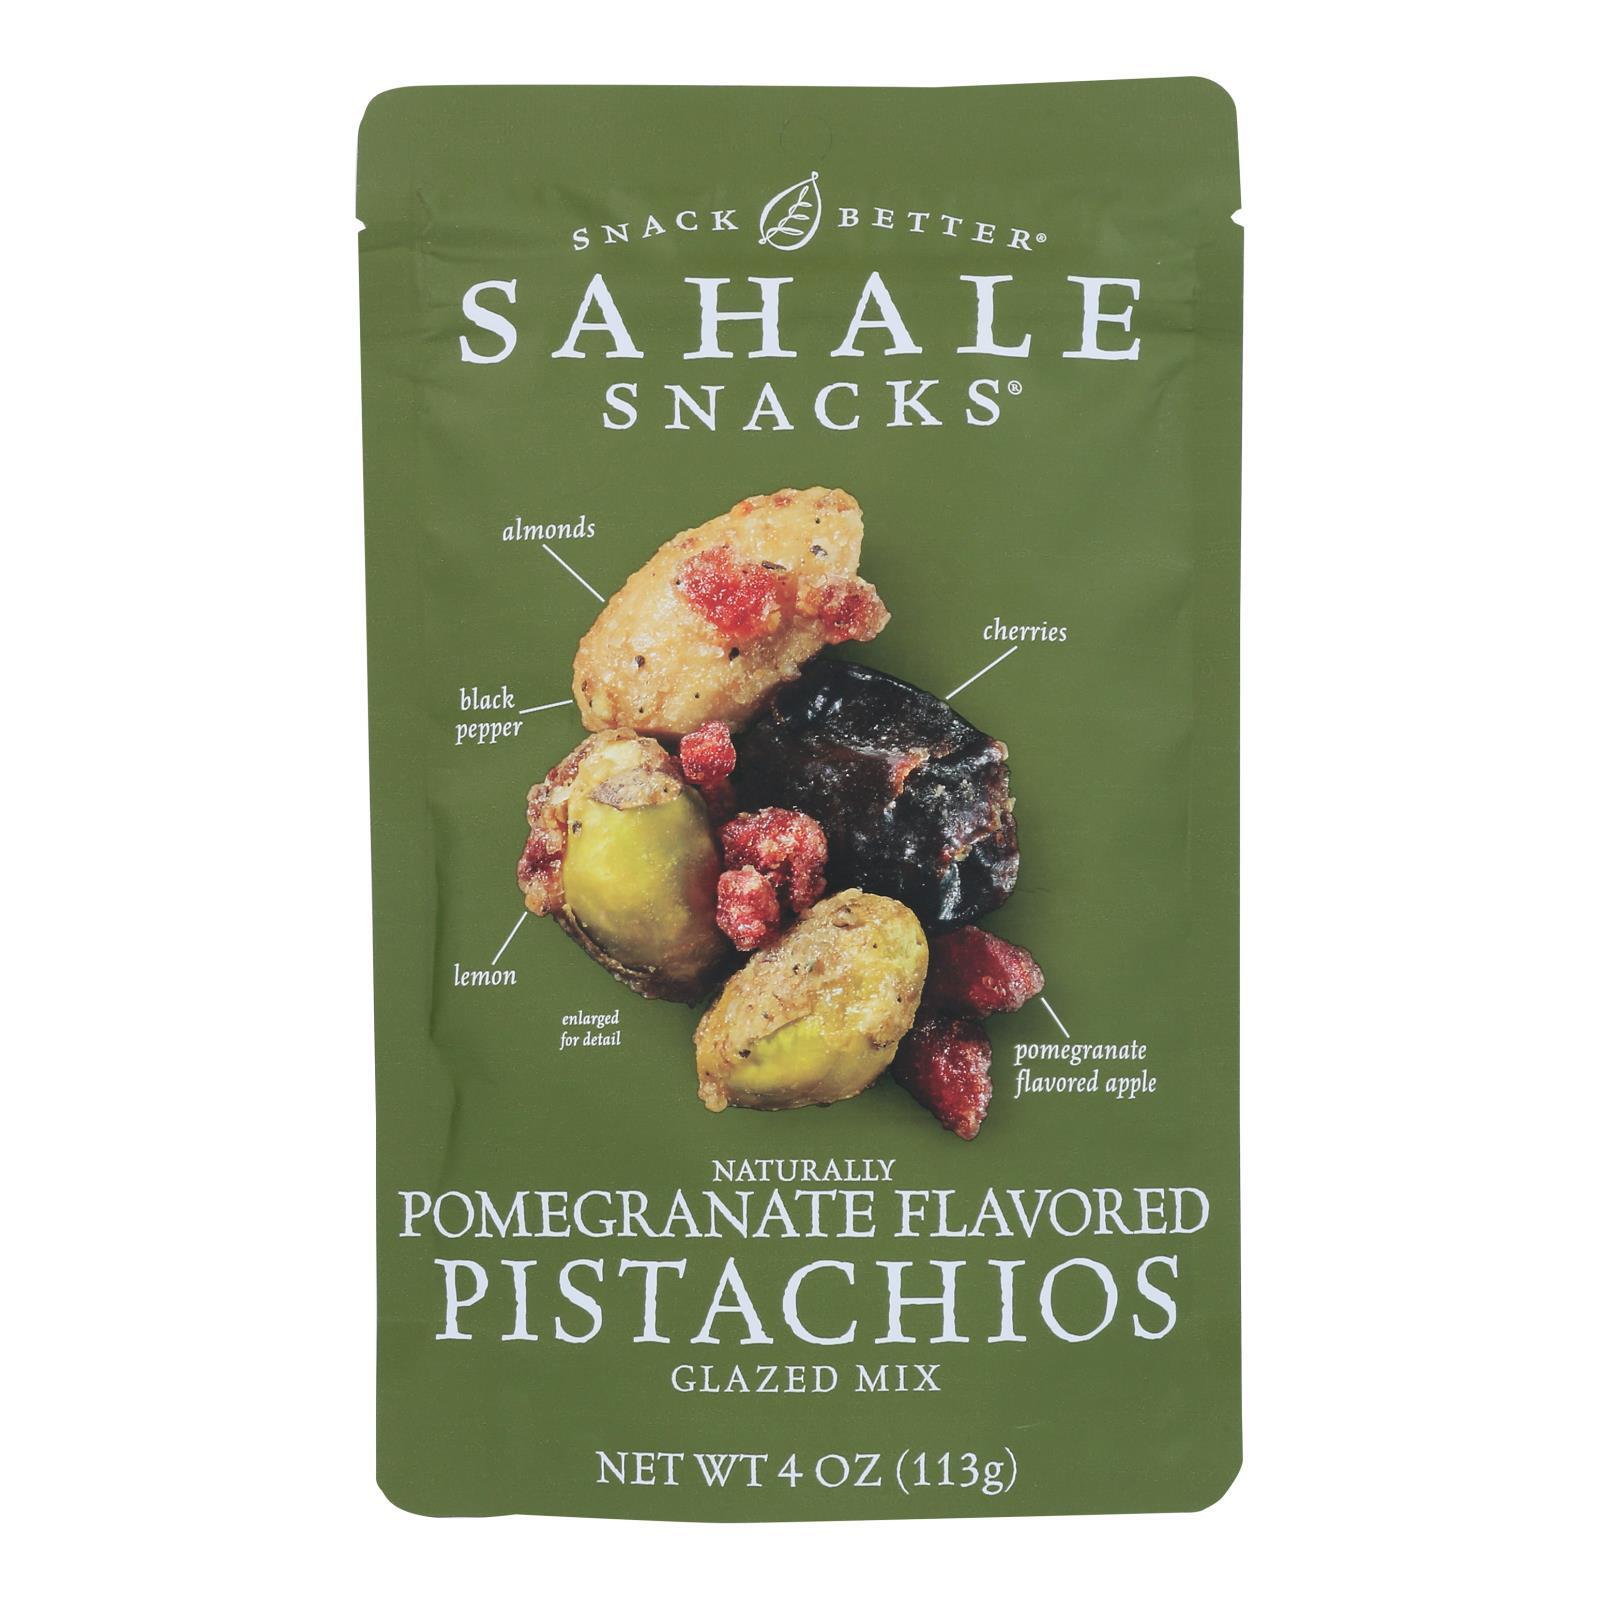 Sahale Snacks Premium Blend Pistachio - Pomegranate - Case of 6 - 4 oz.